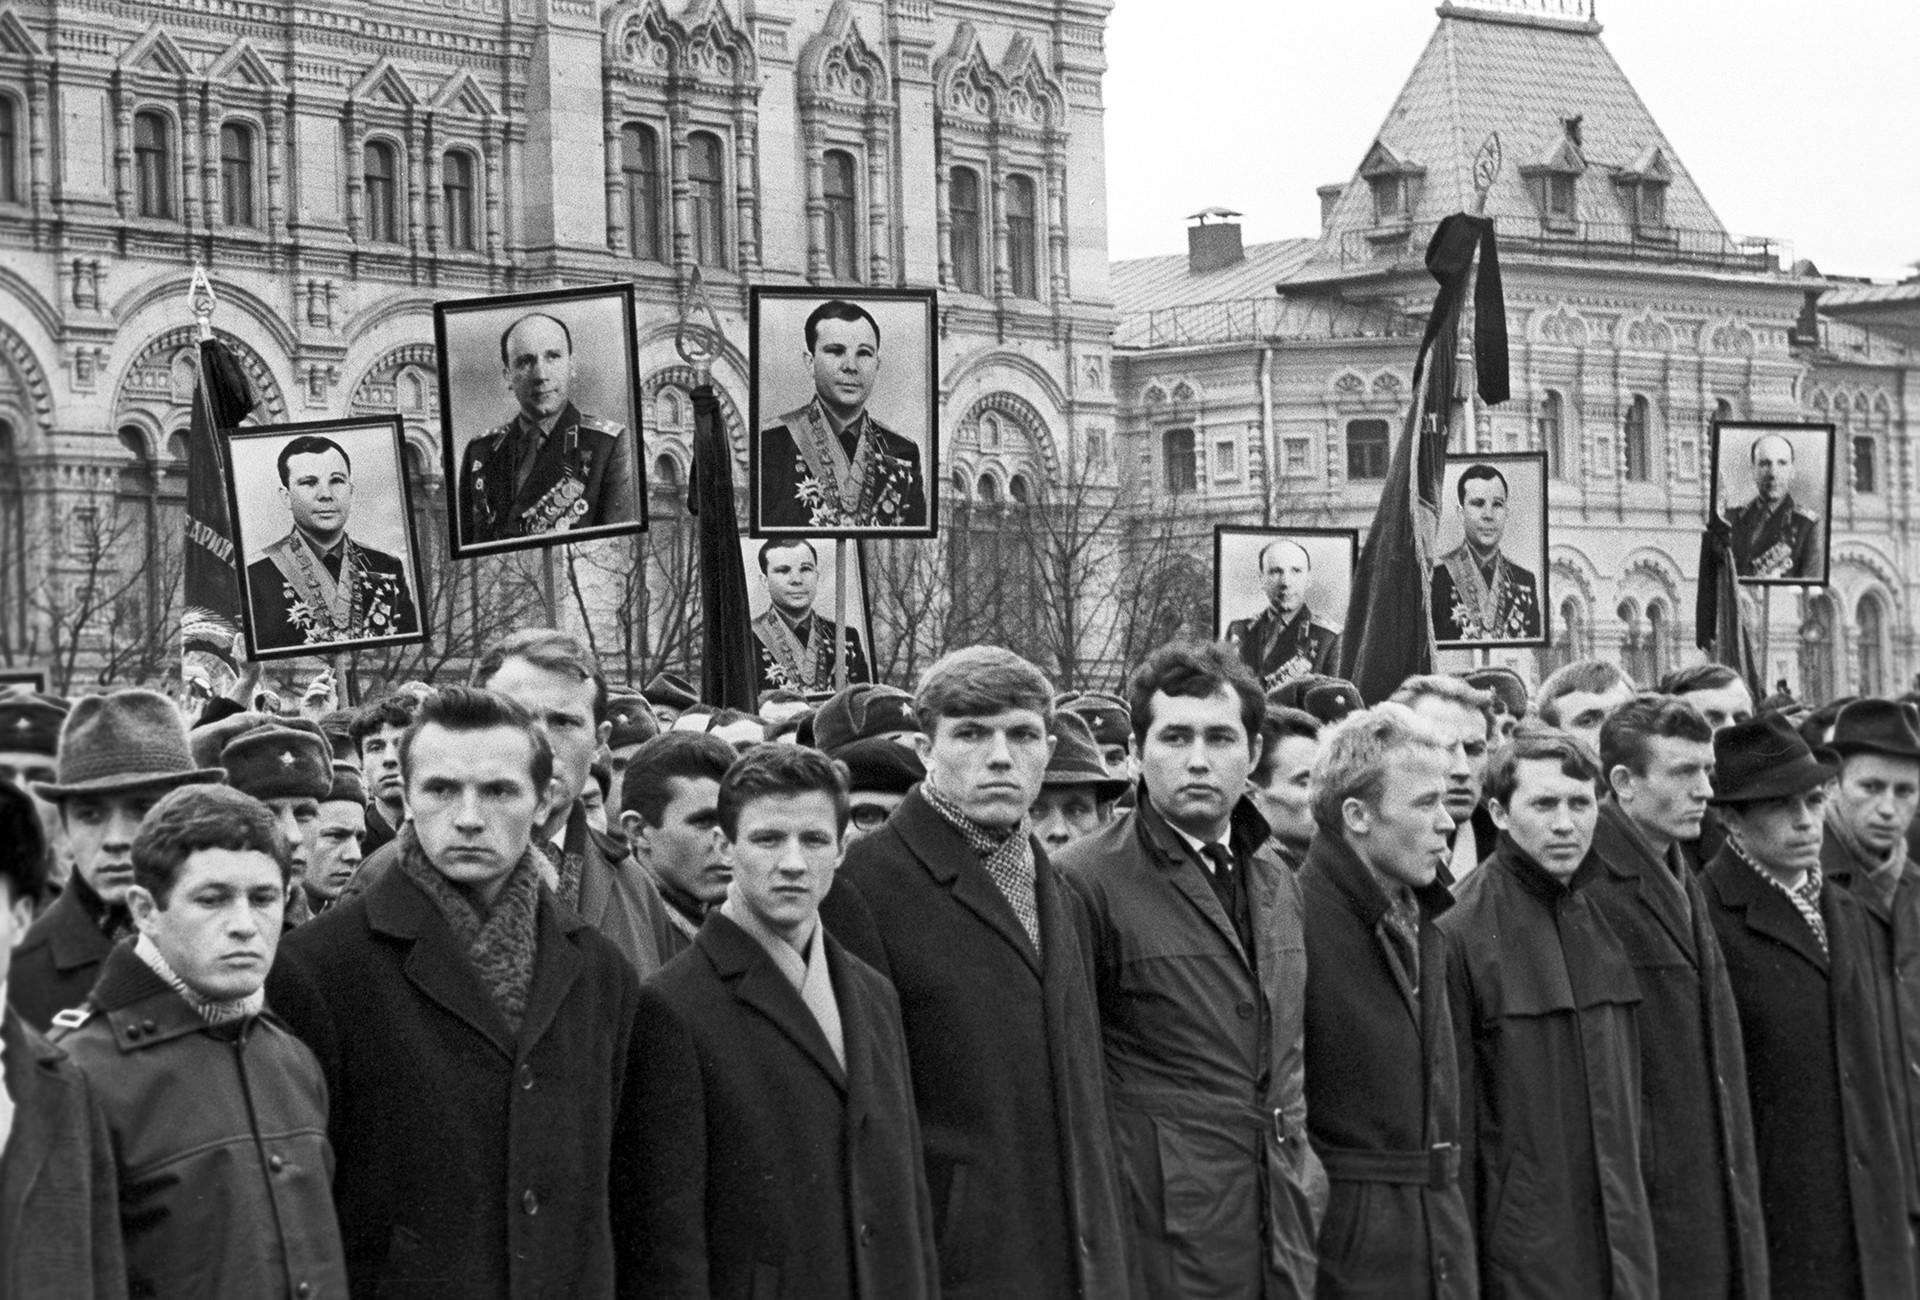 Посмртна поворка на Црвеном тргу, 30. март 1968.